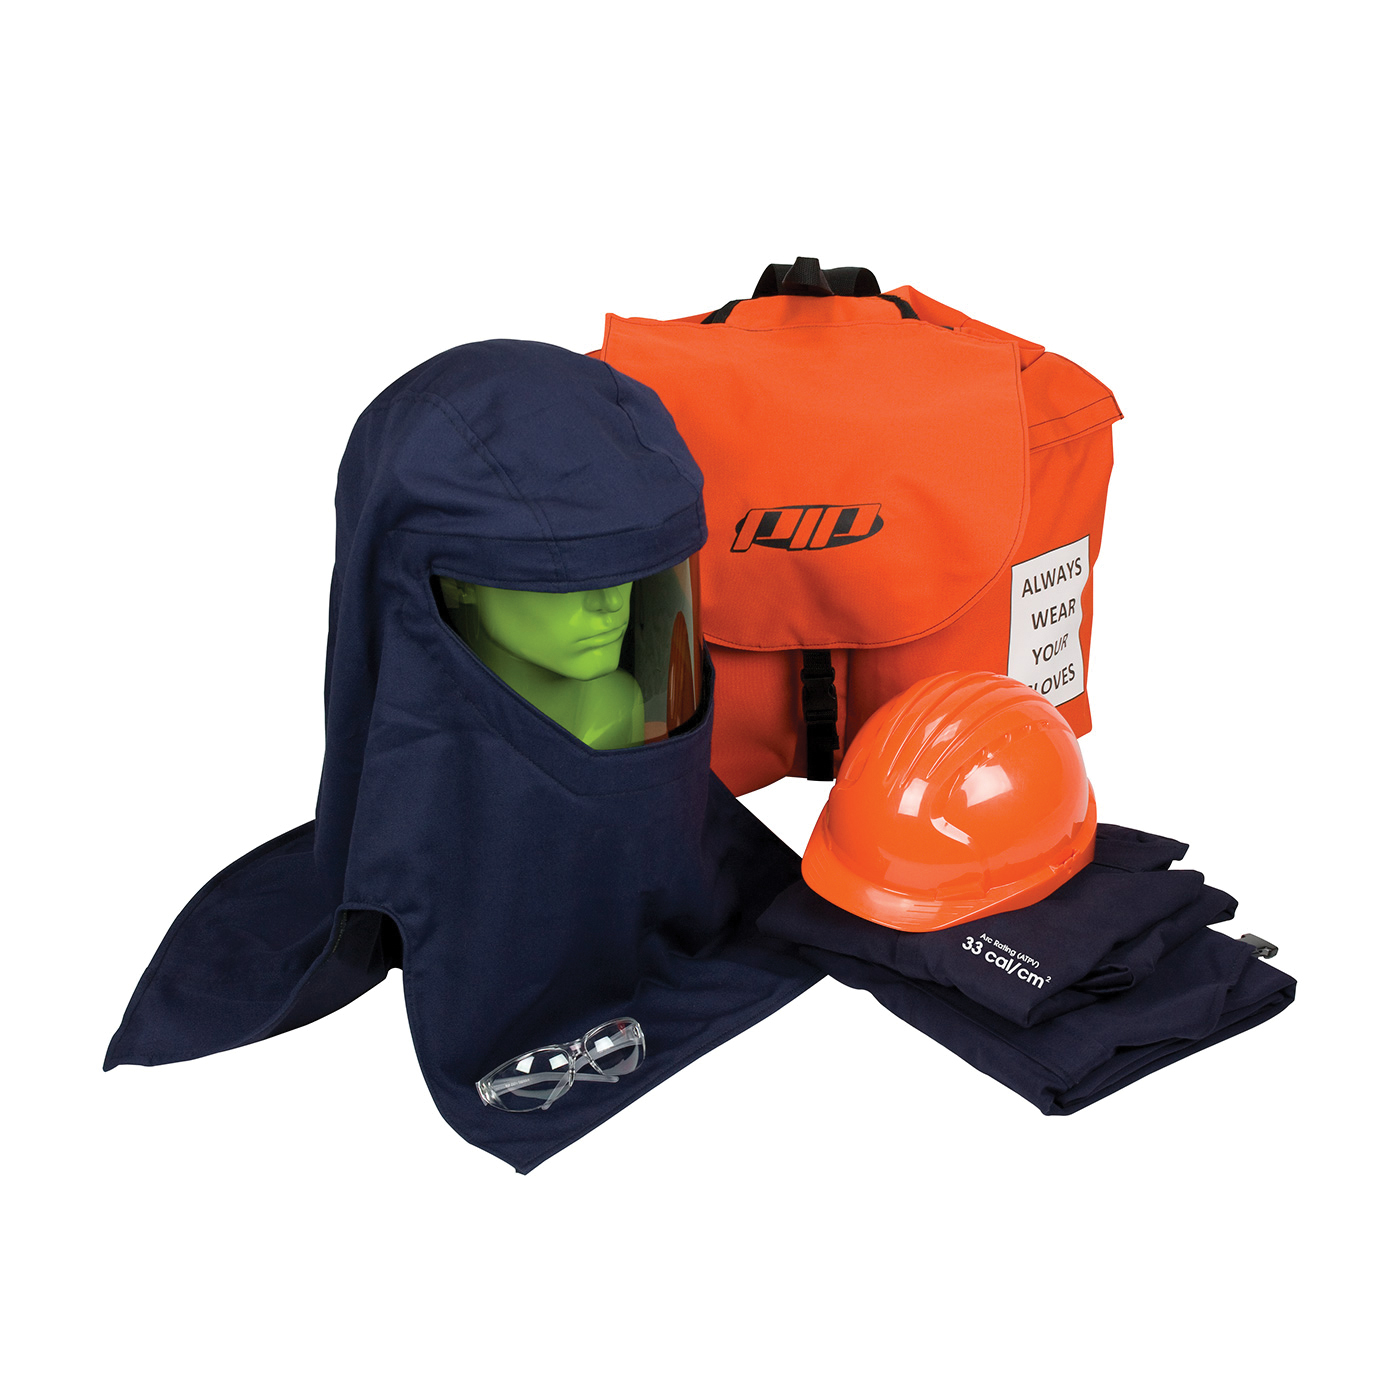 PIP® 9150-21712/2XL Arc Flash Kit, Hazard Risk Category (HRC): 3, Hood/Face Shield Max Arc Flash Protection: 33 cal/sq-cm, Garment Max Arc Flash Protection: 33 cal/sq-cm, Specifications Met: ASTM F1506, ASTM F 2178-12, NFPA 70E-2018, OSHA 29 CFR 1910.269